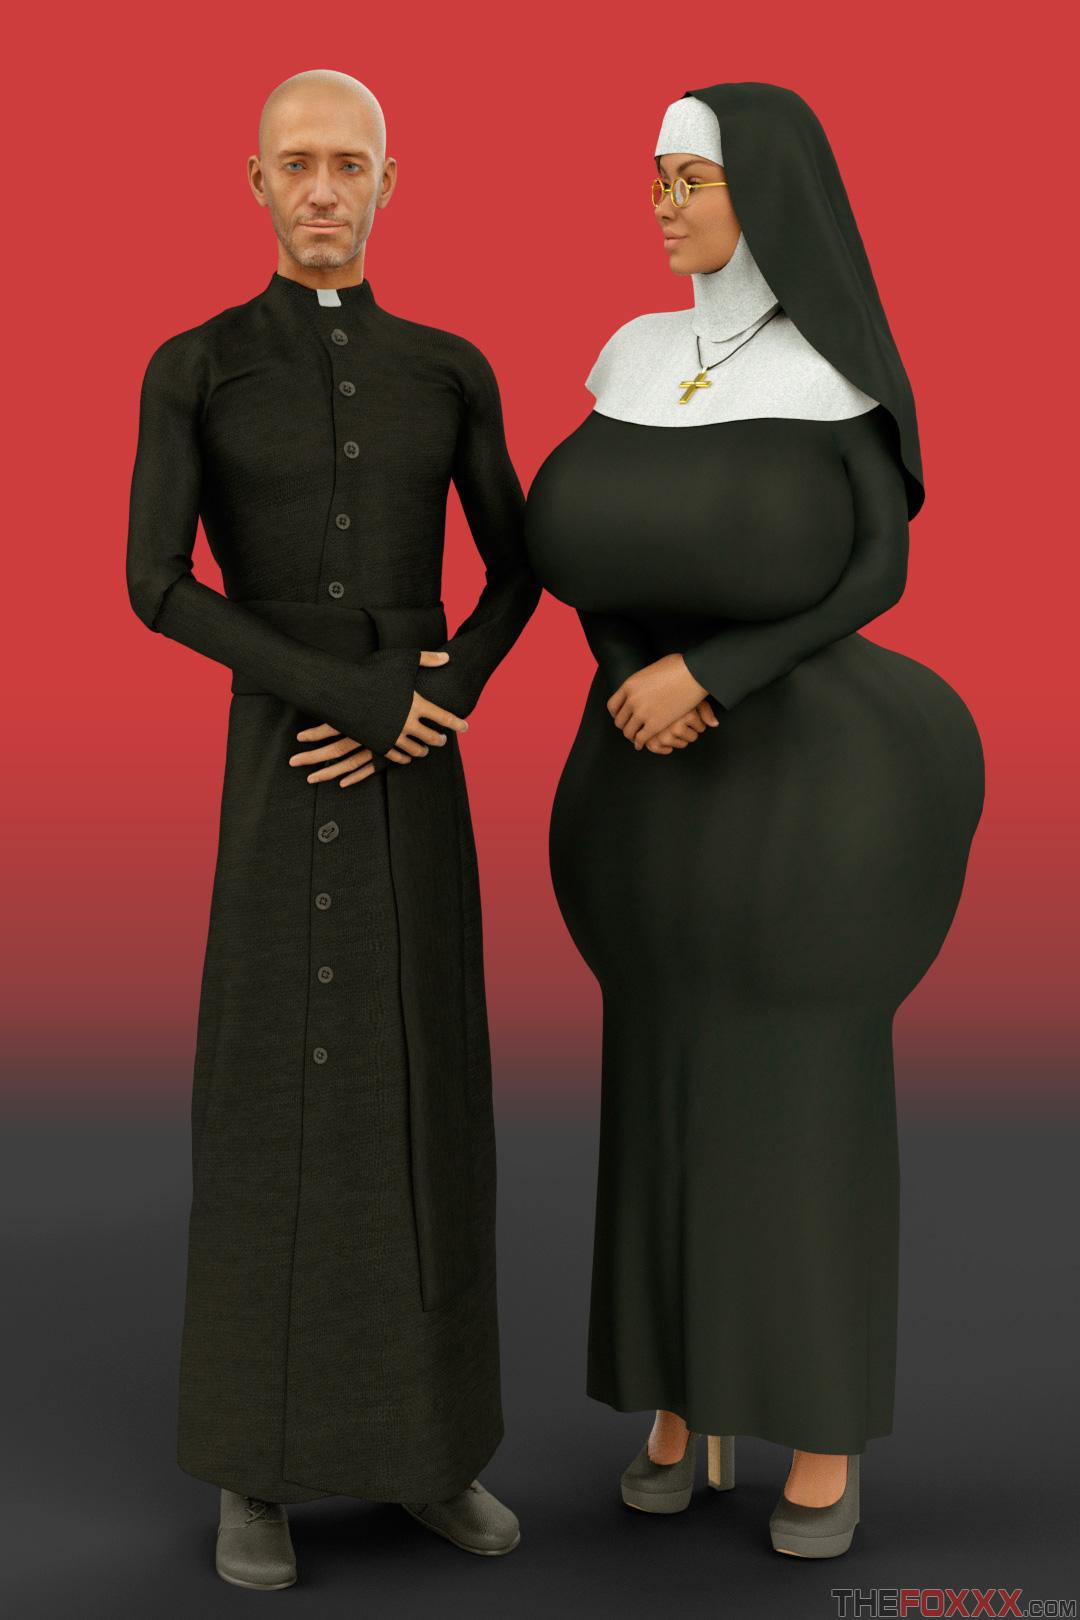 Porn Comics - Mother Hoare & Father Assman- The Foxxx porn comics 8 muses